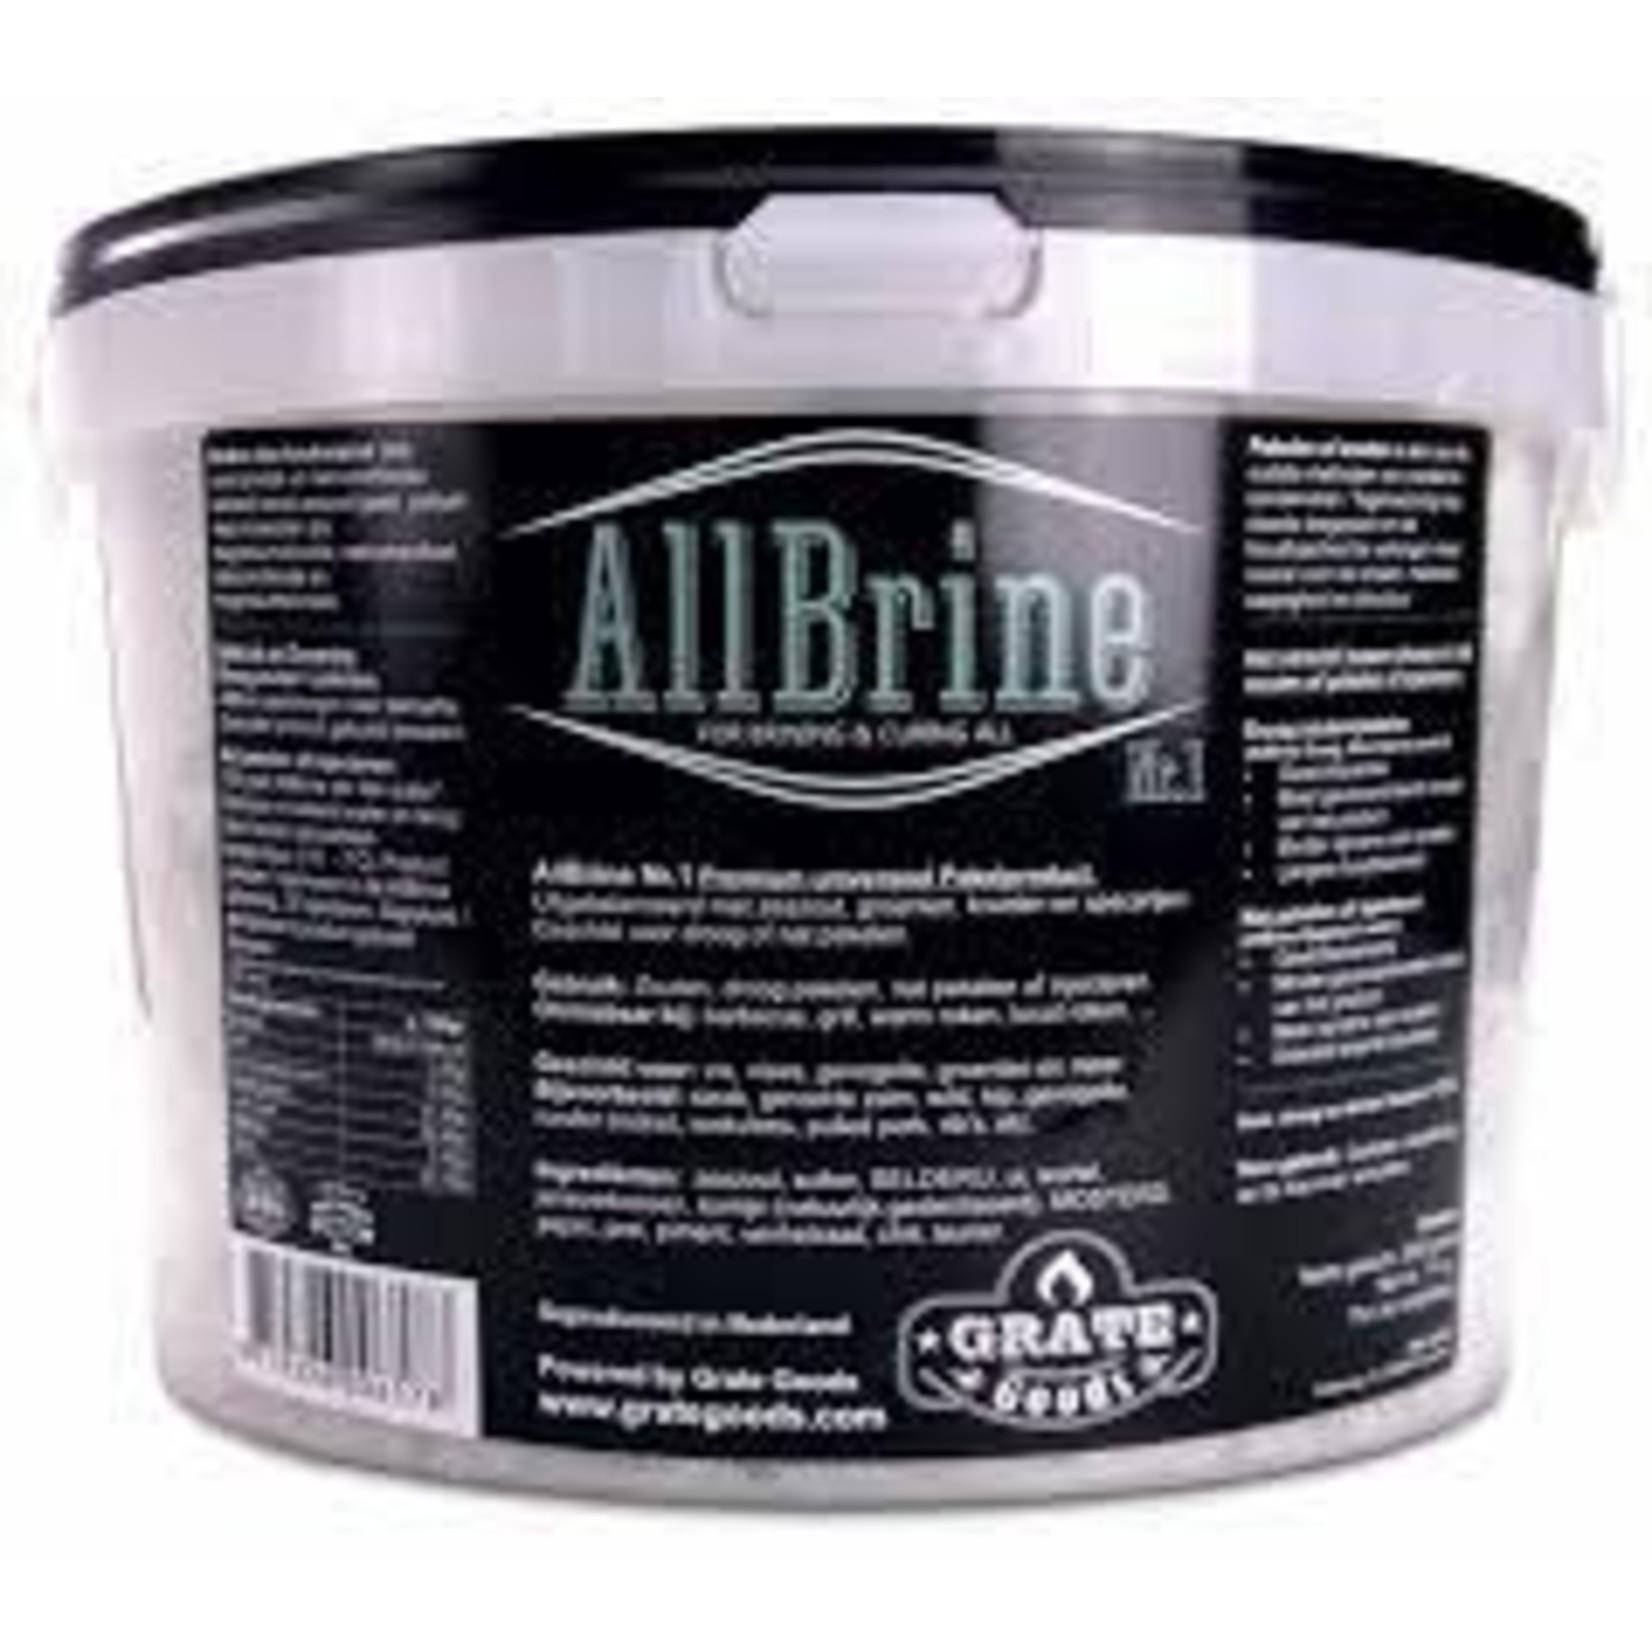 Grate Goods Grate Goods Allbrine nr1 2kilo